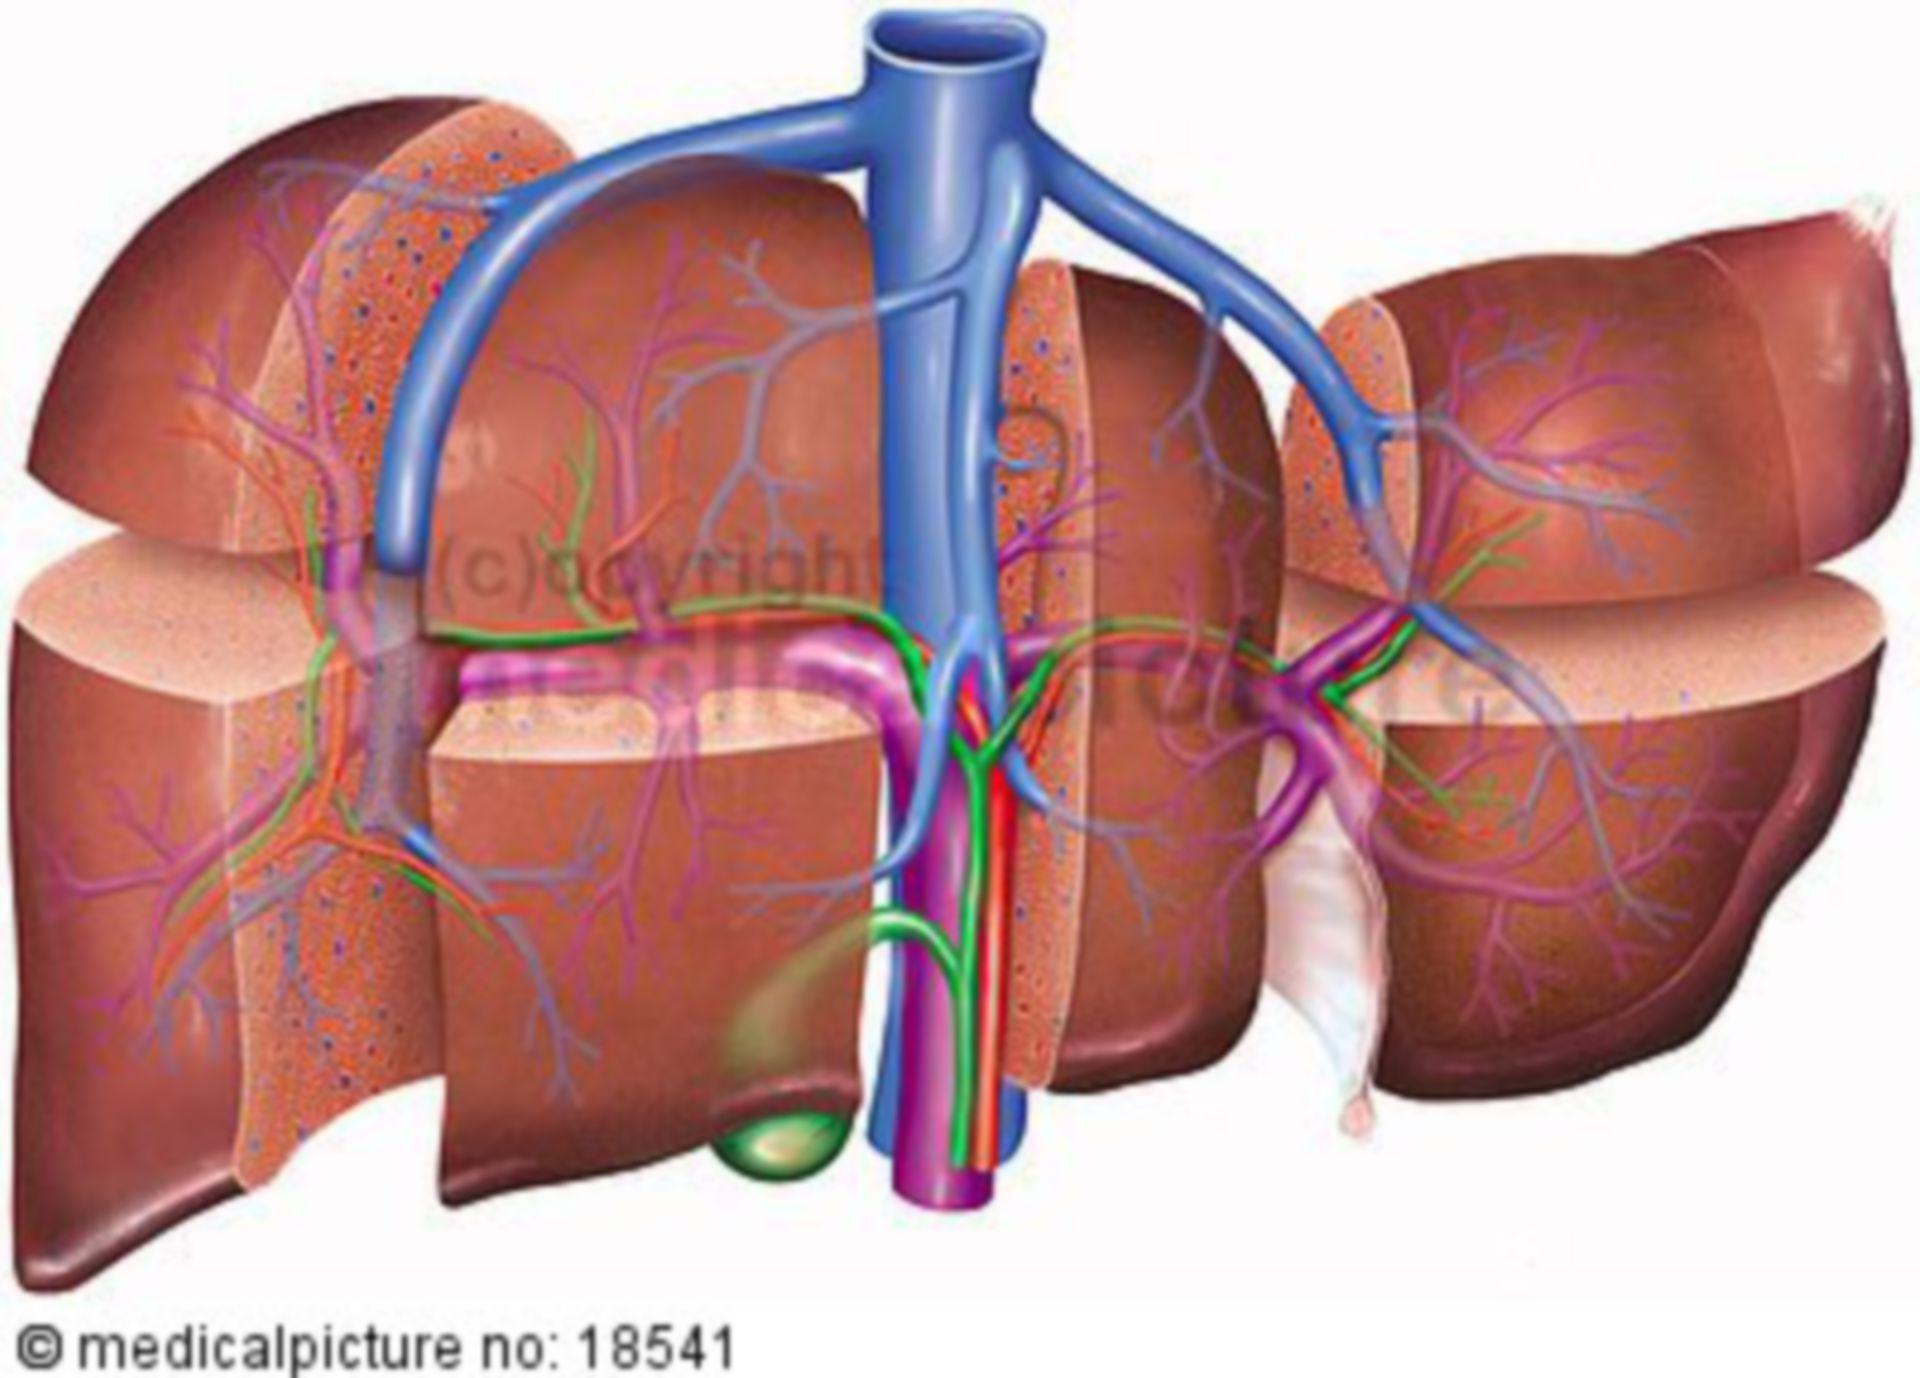 Segments of the liver